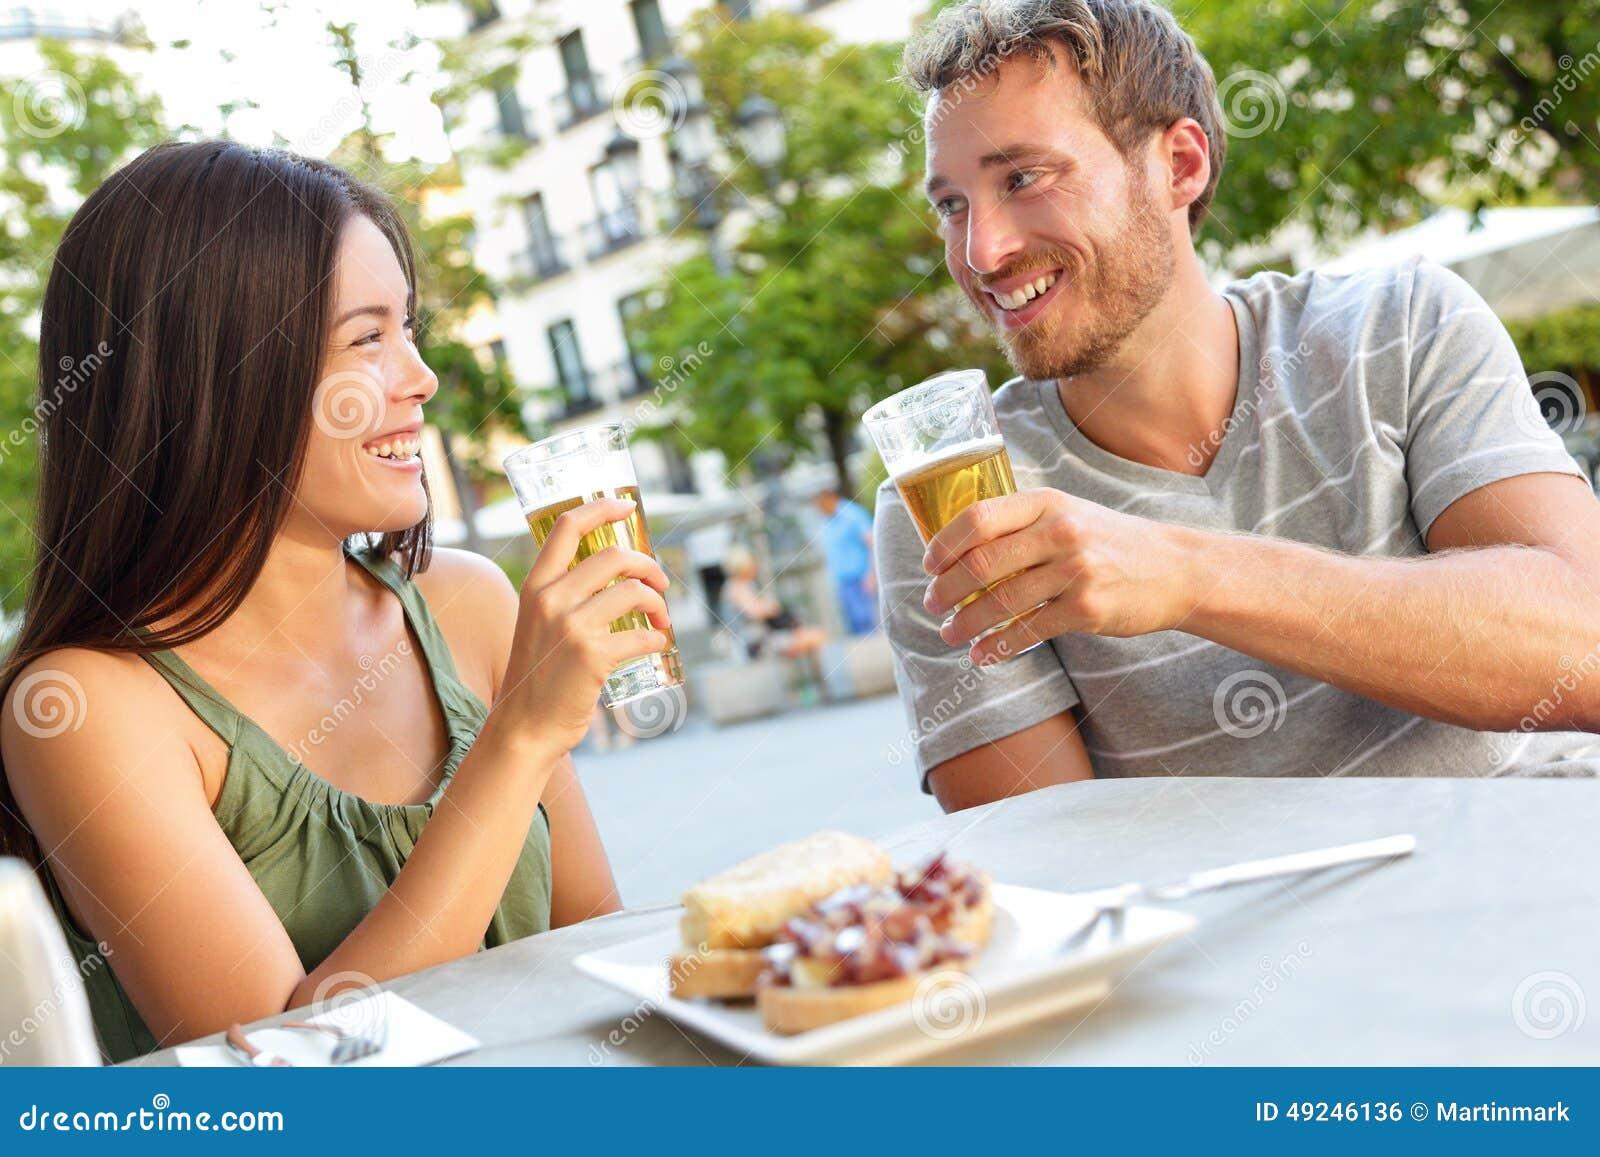 Valladolid Dating Spanish Drinks Hookup